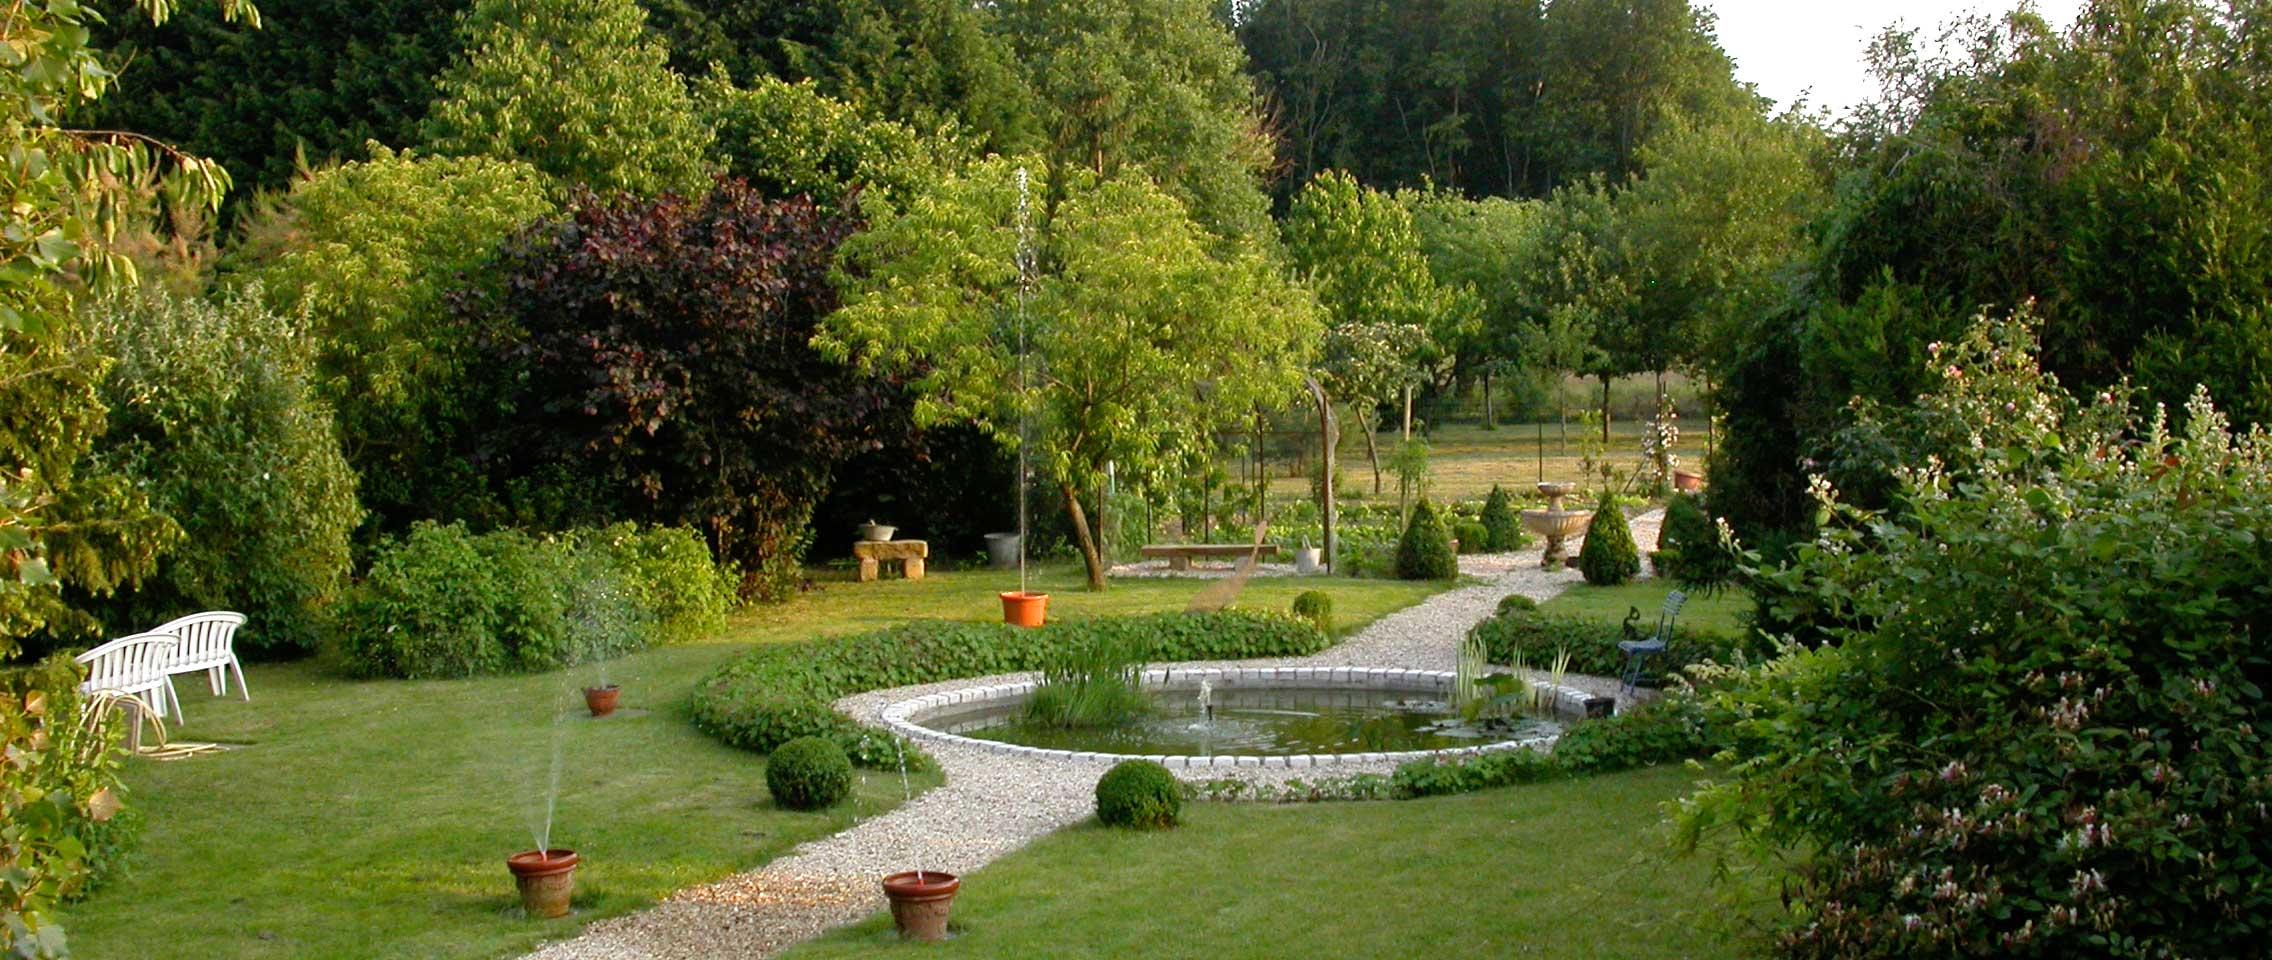 Le bassin du jardin